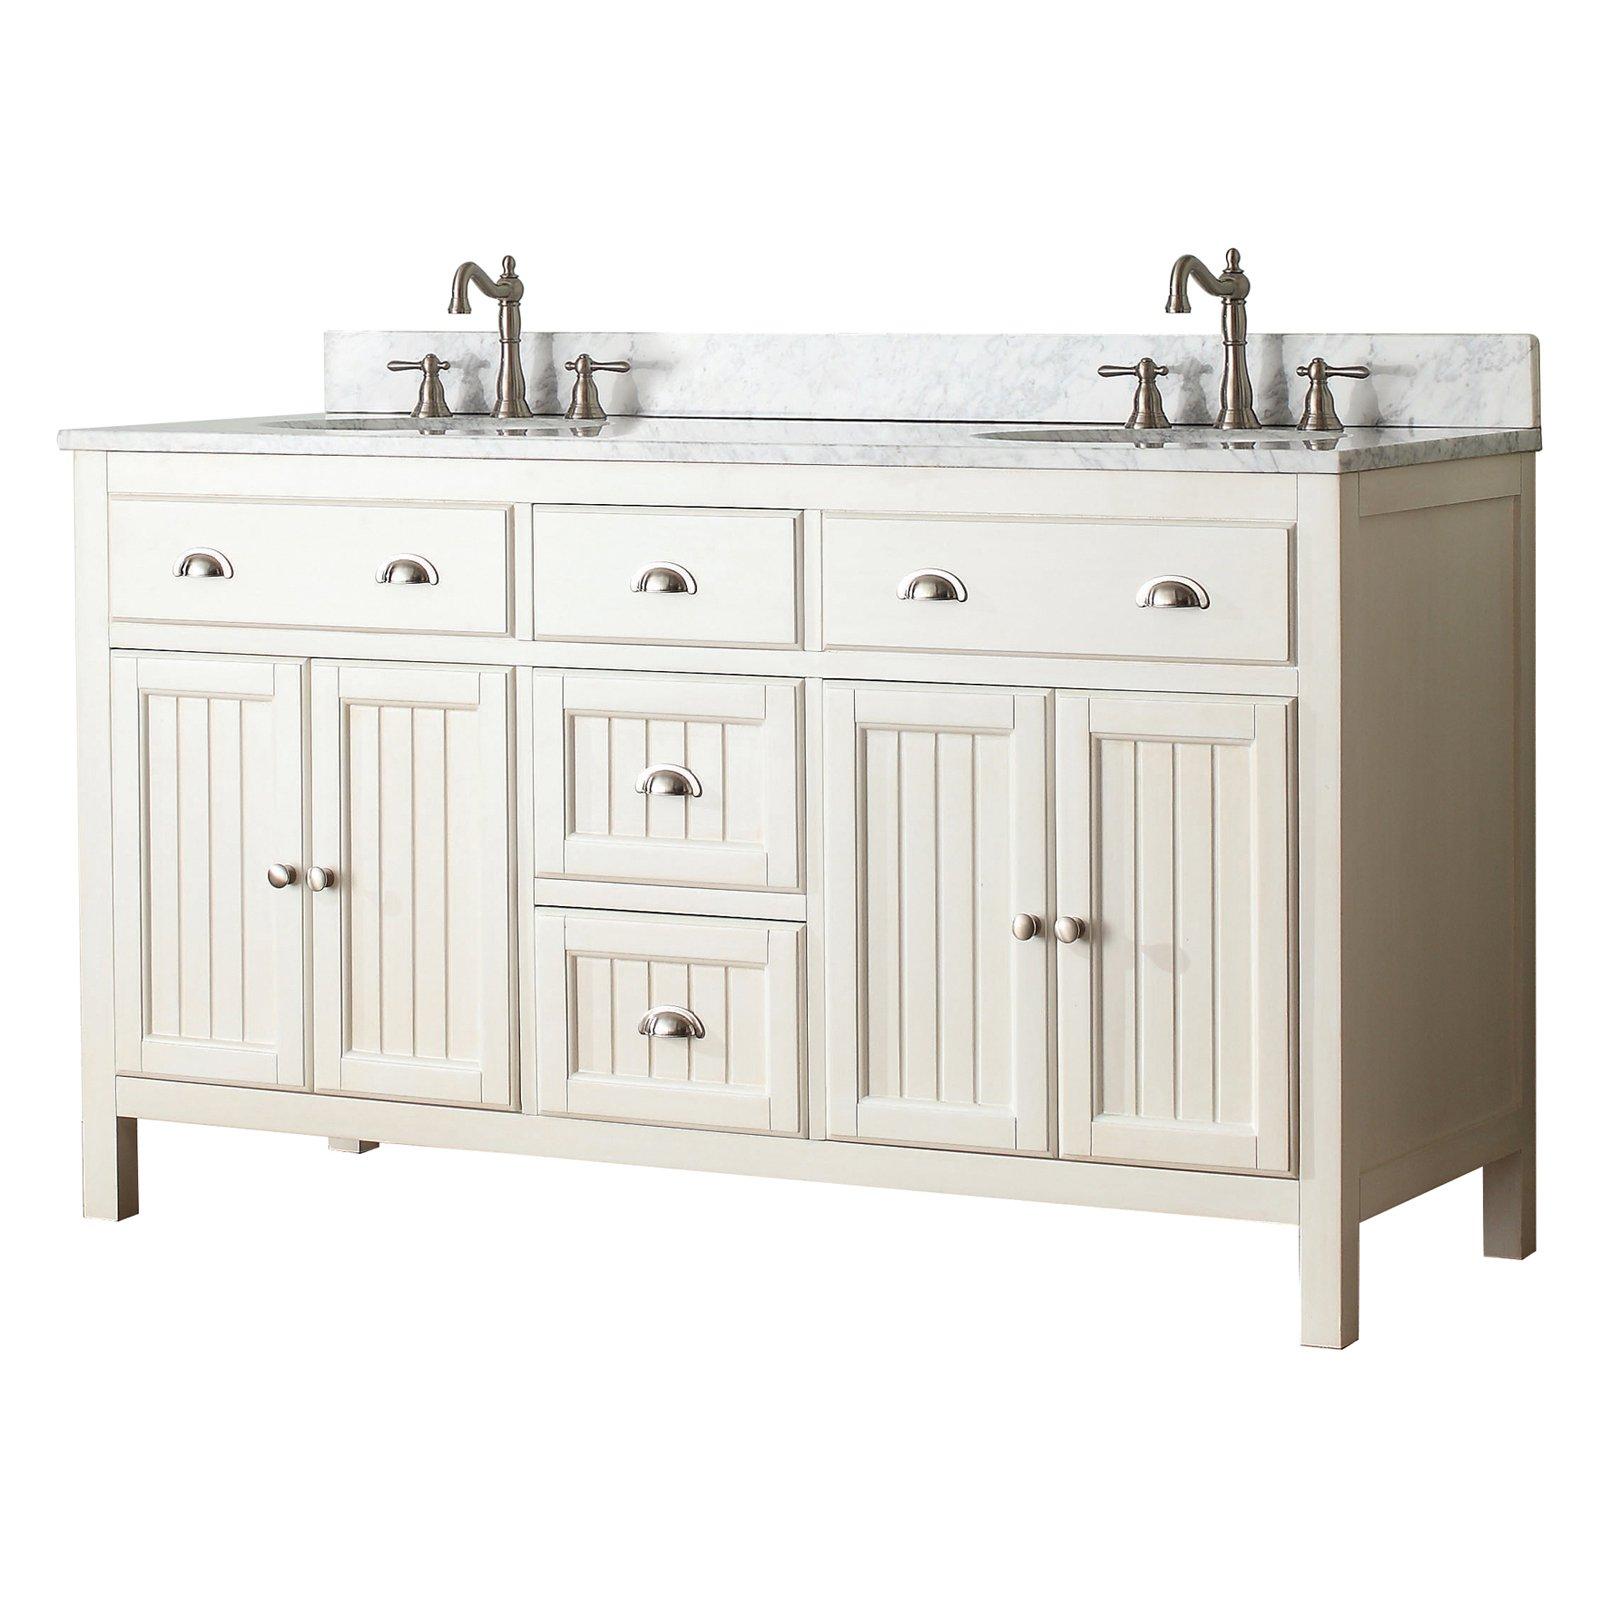 avanity hamilton vs60 fw hamilton 60 in double bathroom vanity rh pinterest com